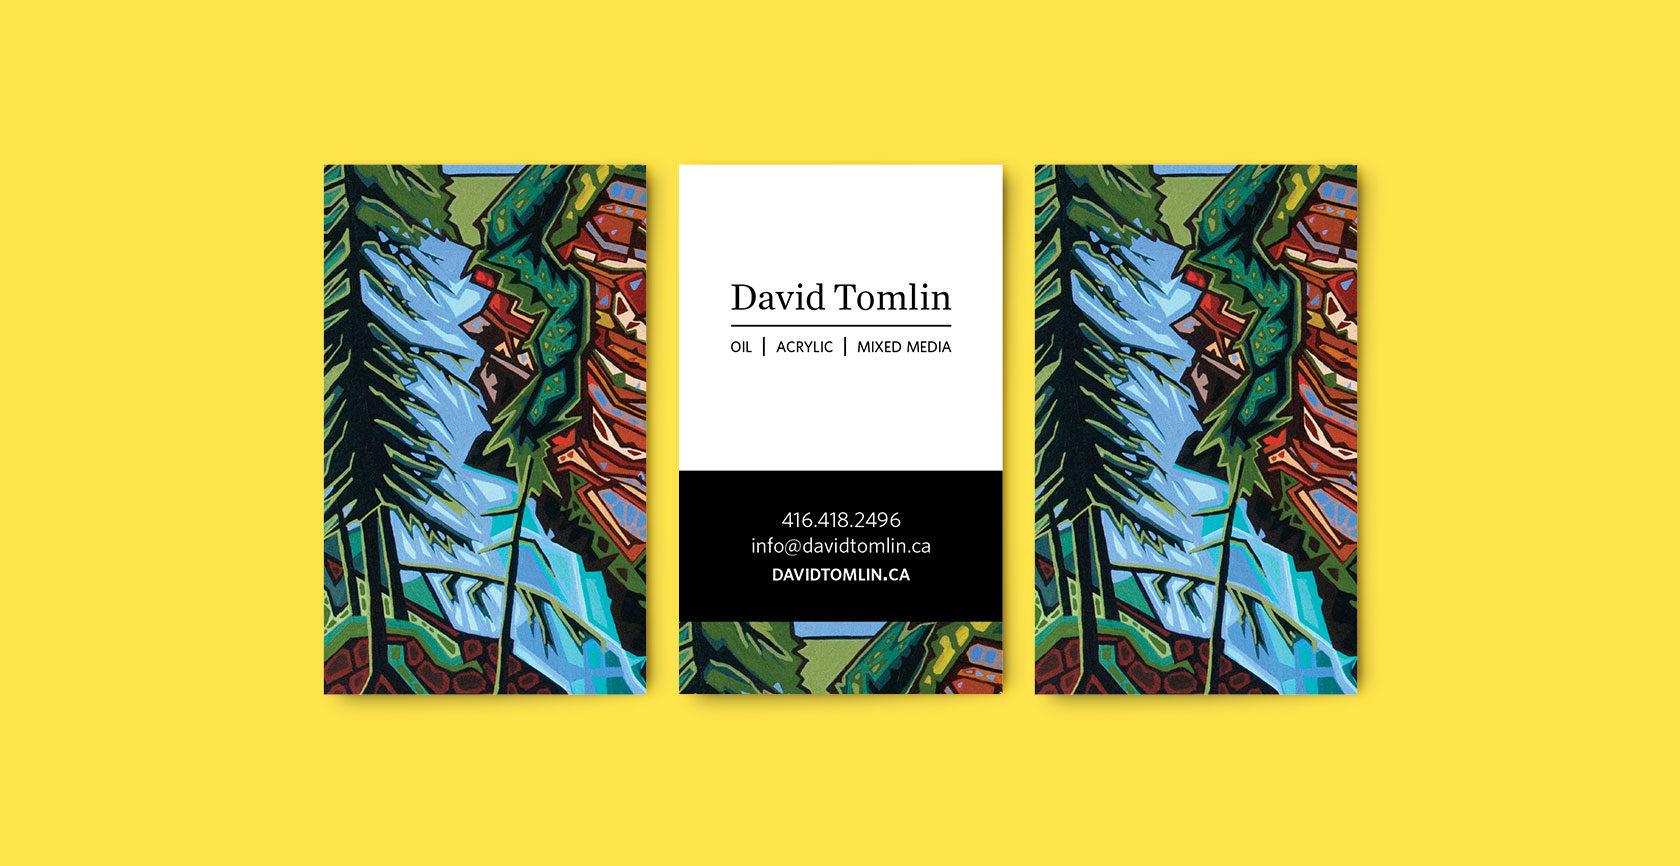 David Tomlin Business Cards Design by Furia